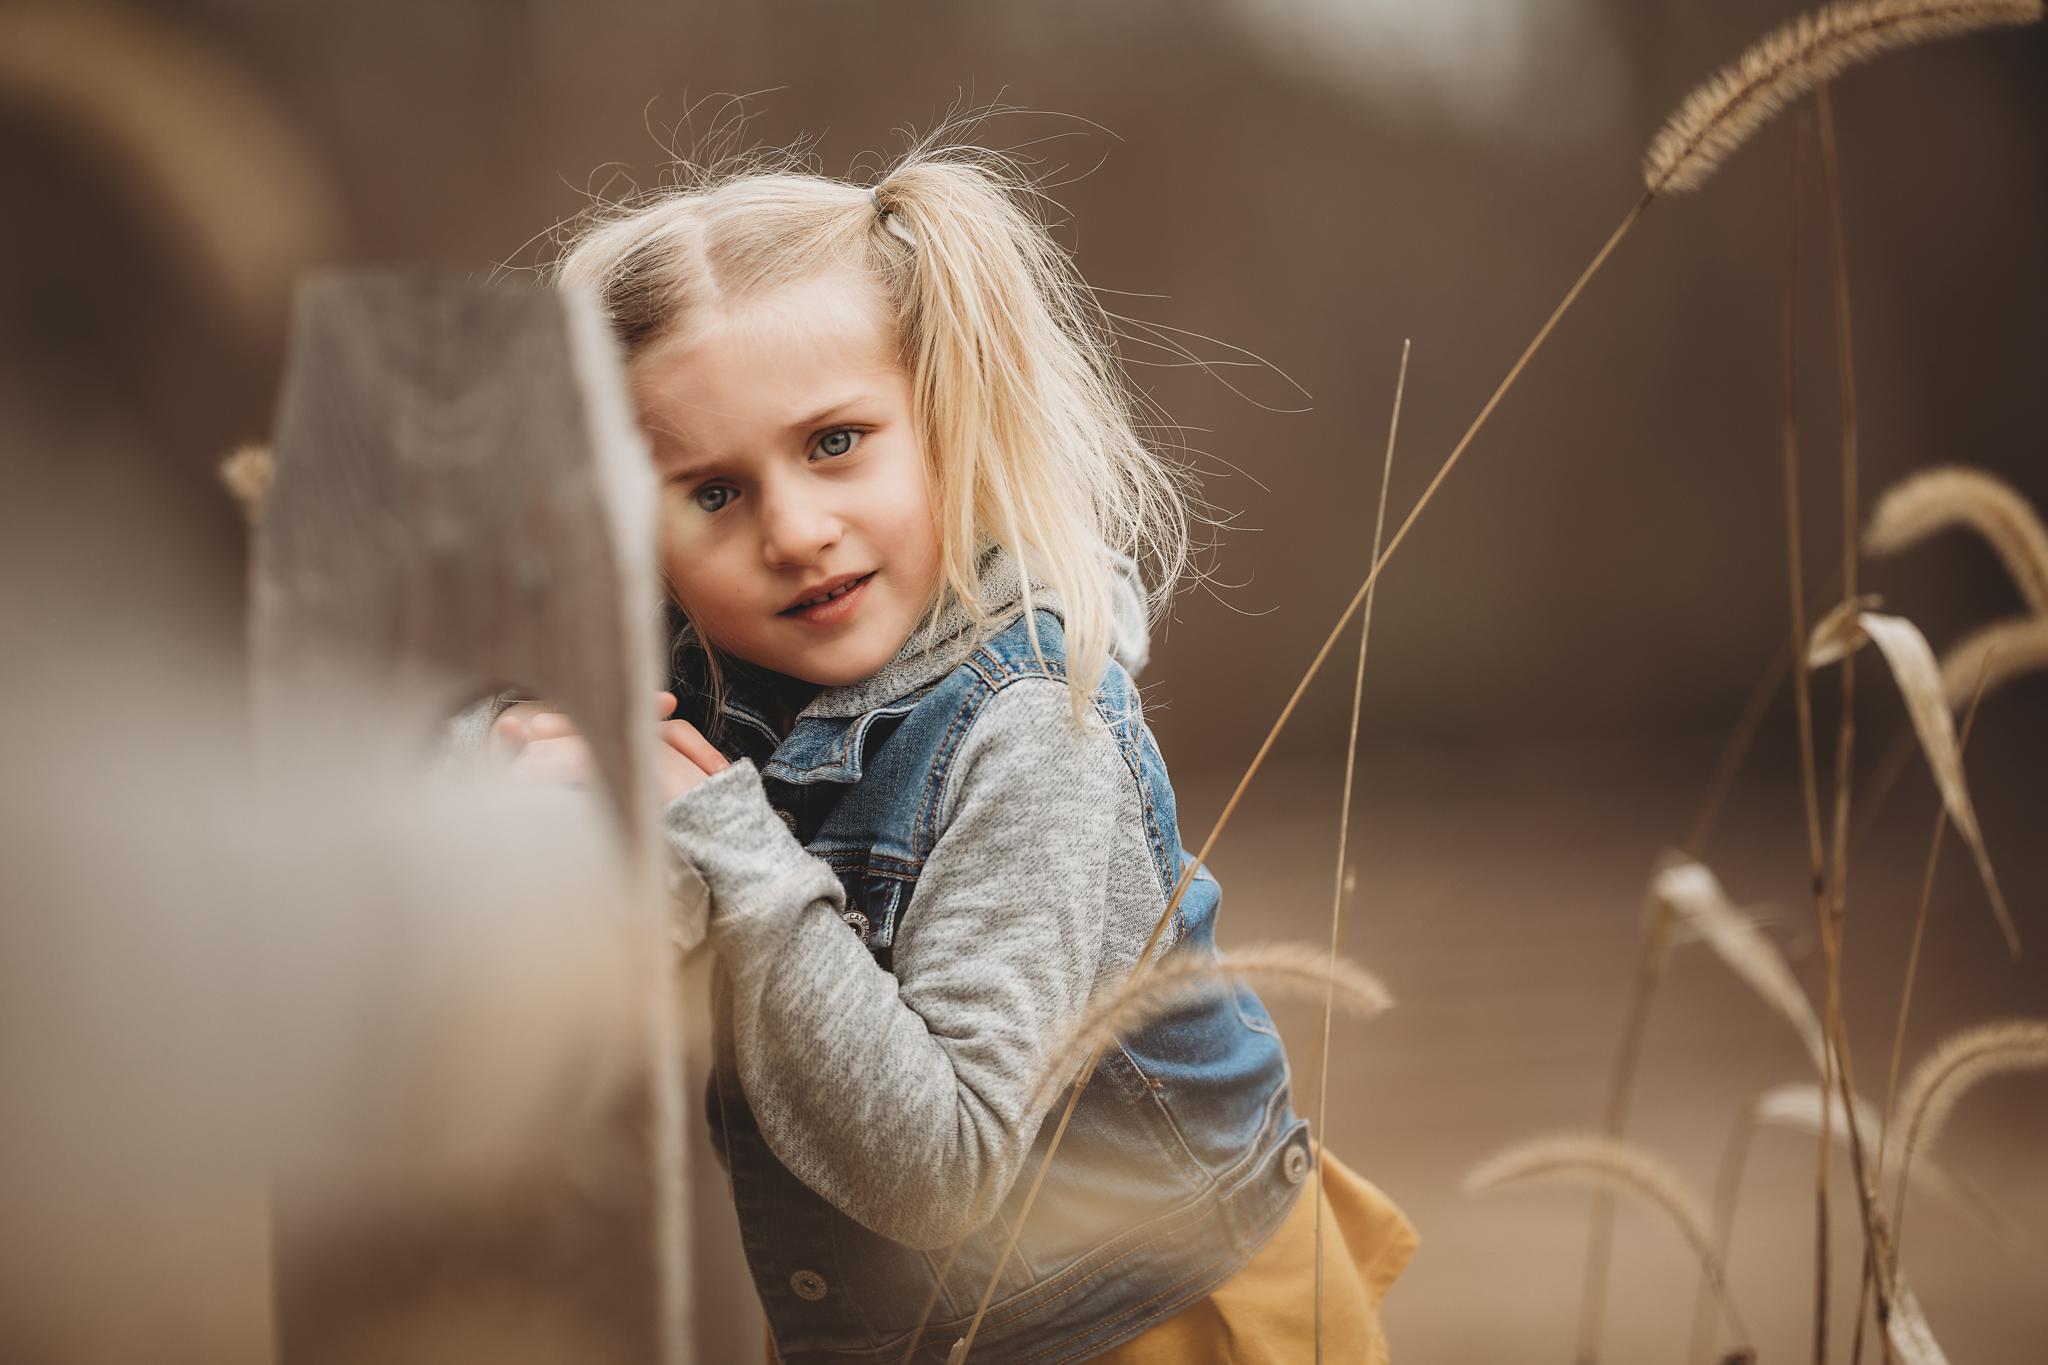 Long-island-photographer-hello-olivia-photography-children-kids-photos-new-york-lifestyle-portraits-suffolk-County-LI-40.jpg